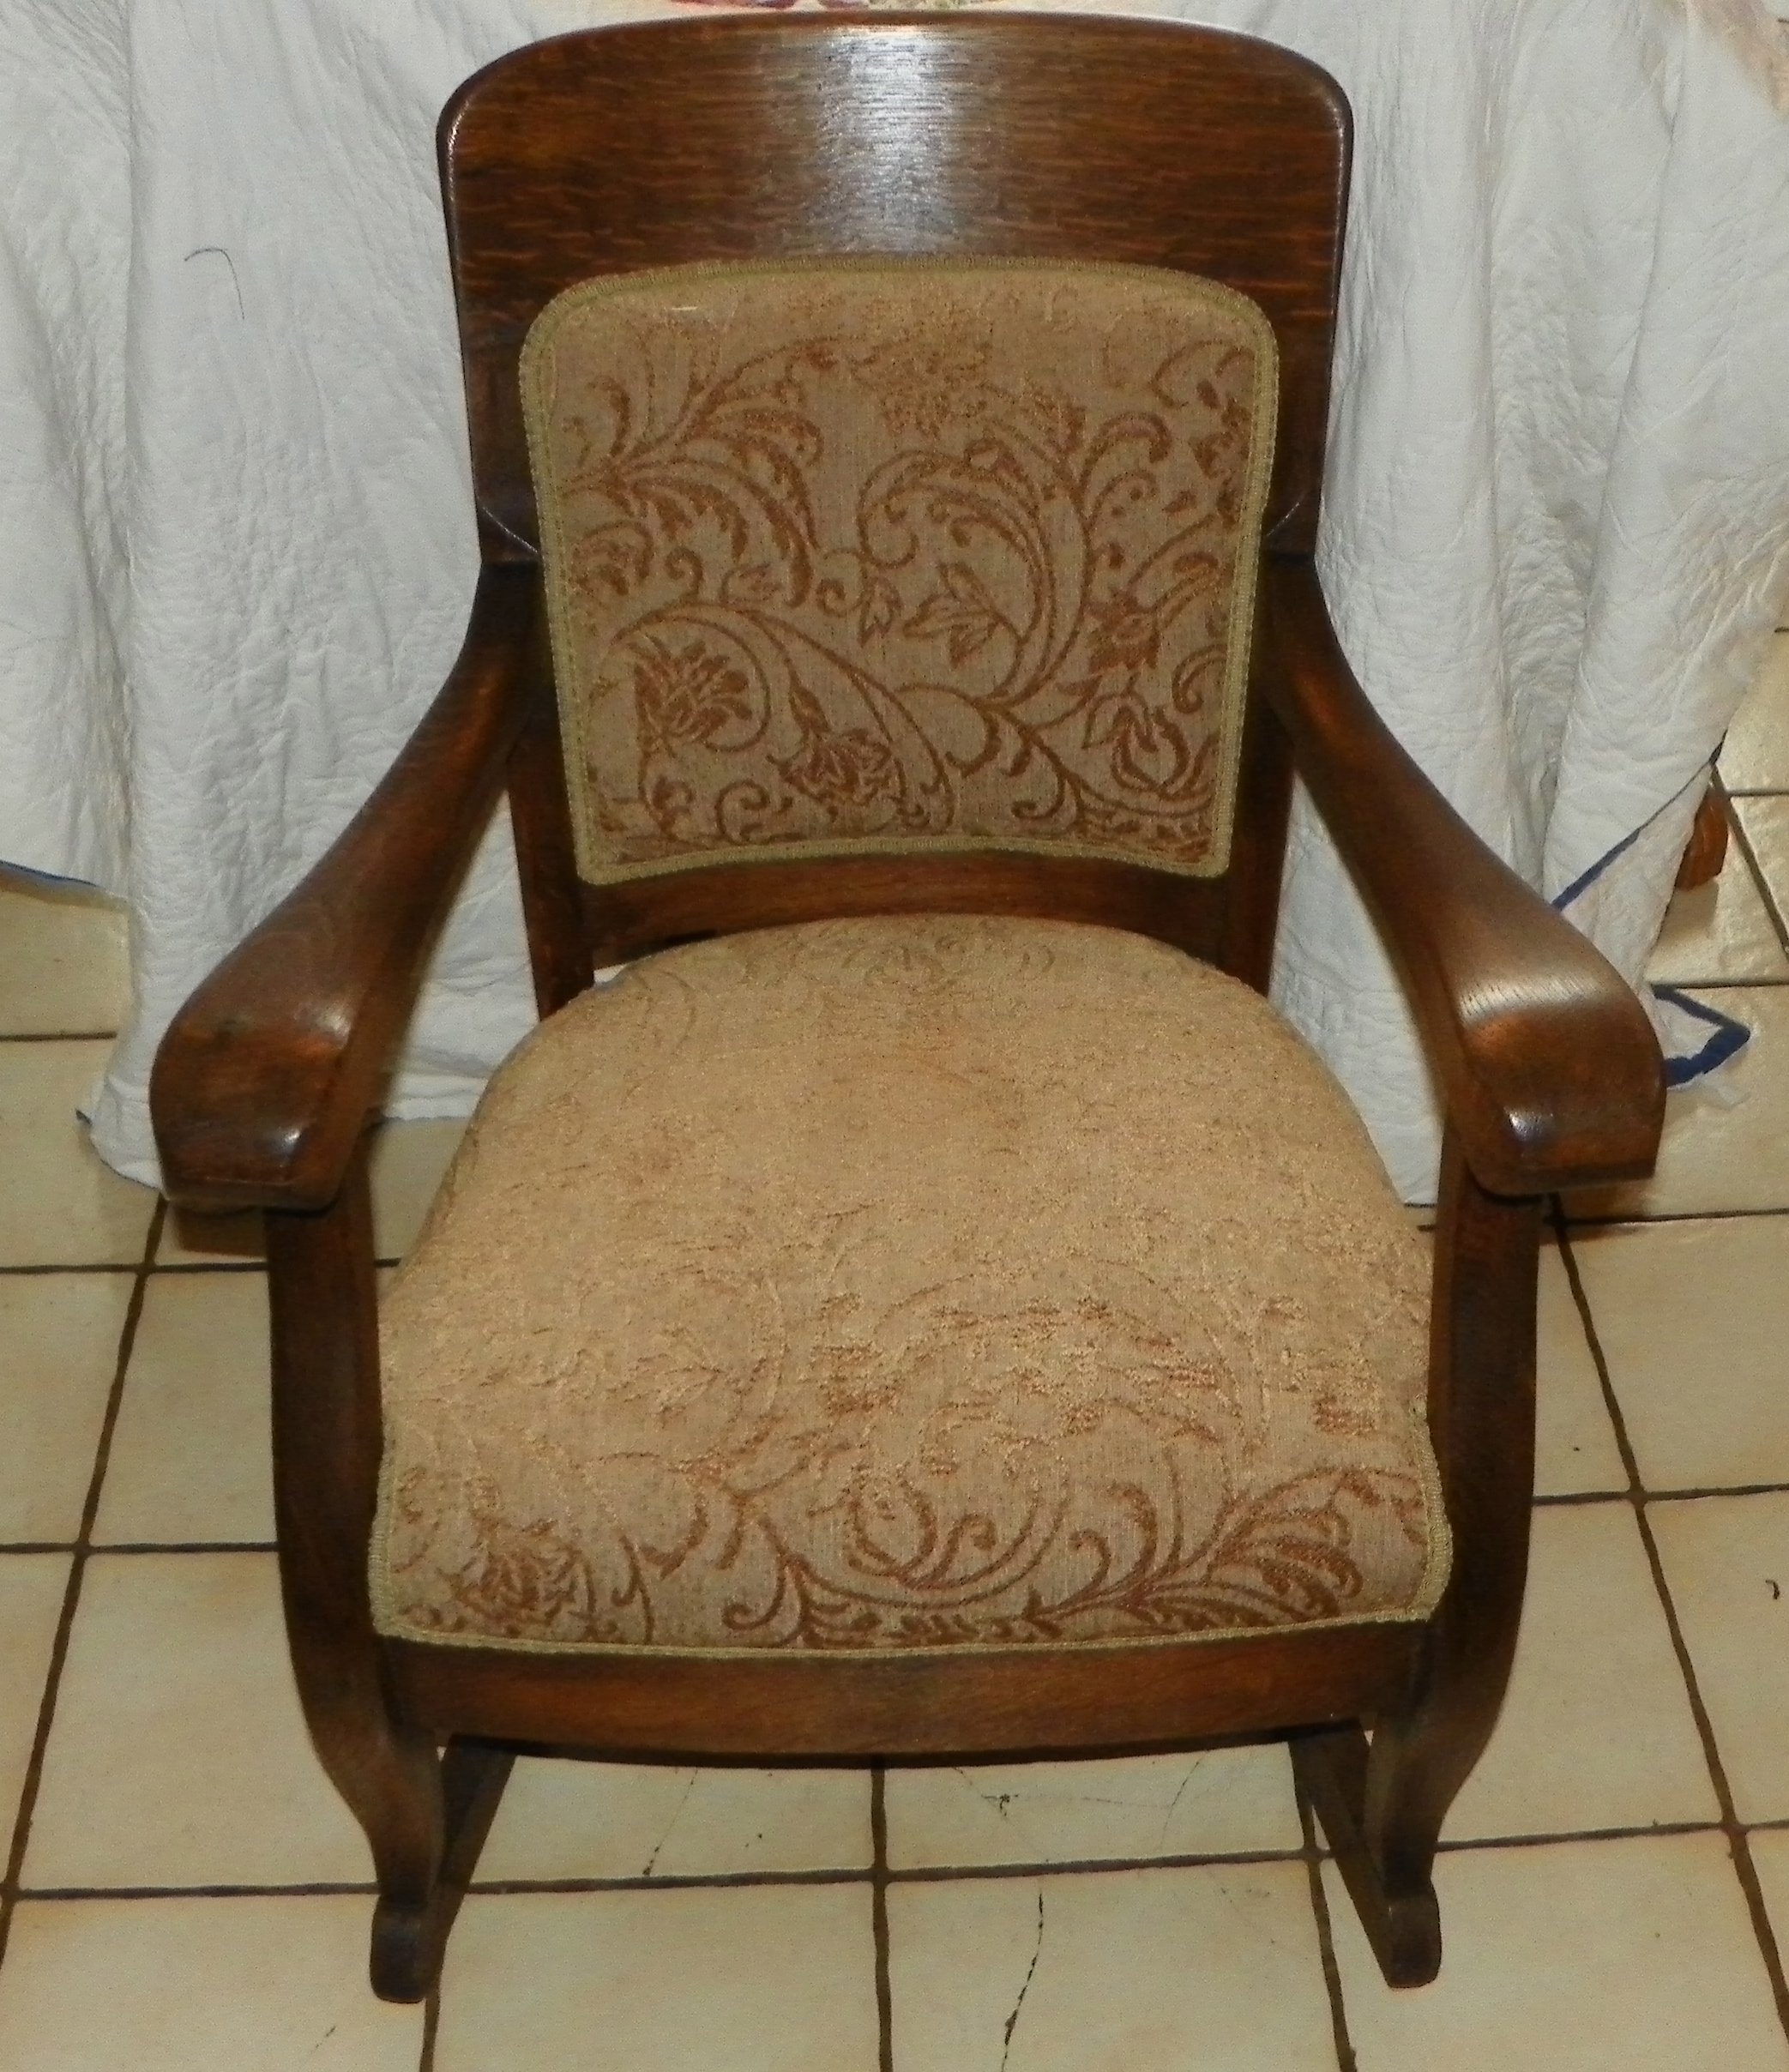 quartersawn oak empire rocker rocking chair r177 for sale classifieds. Black Bedroom Furniture Sets. Home Design Ideas